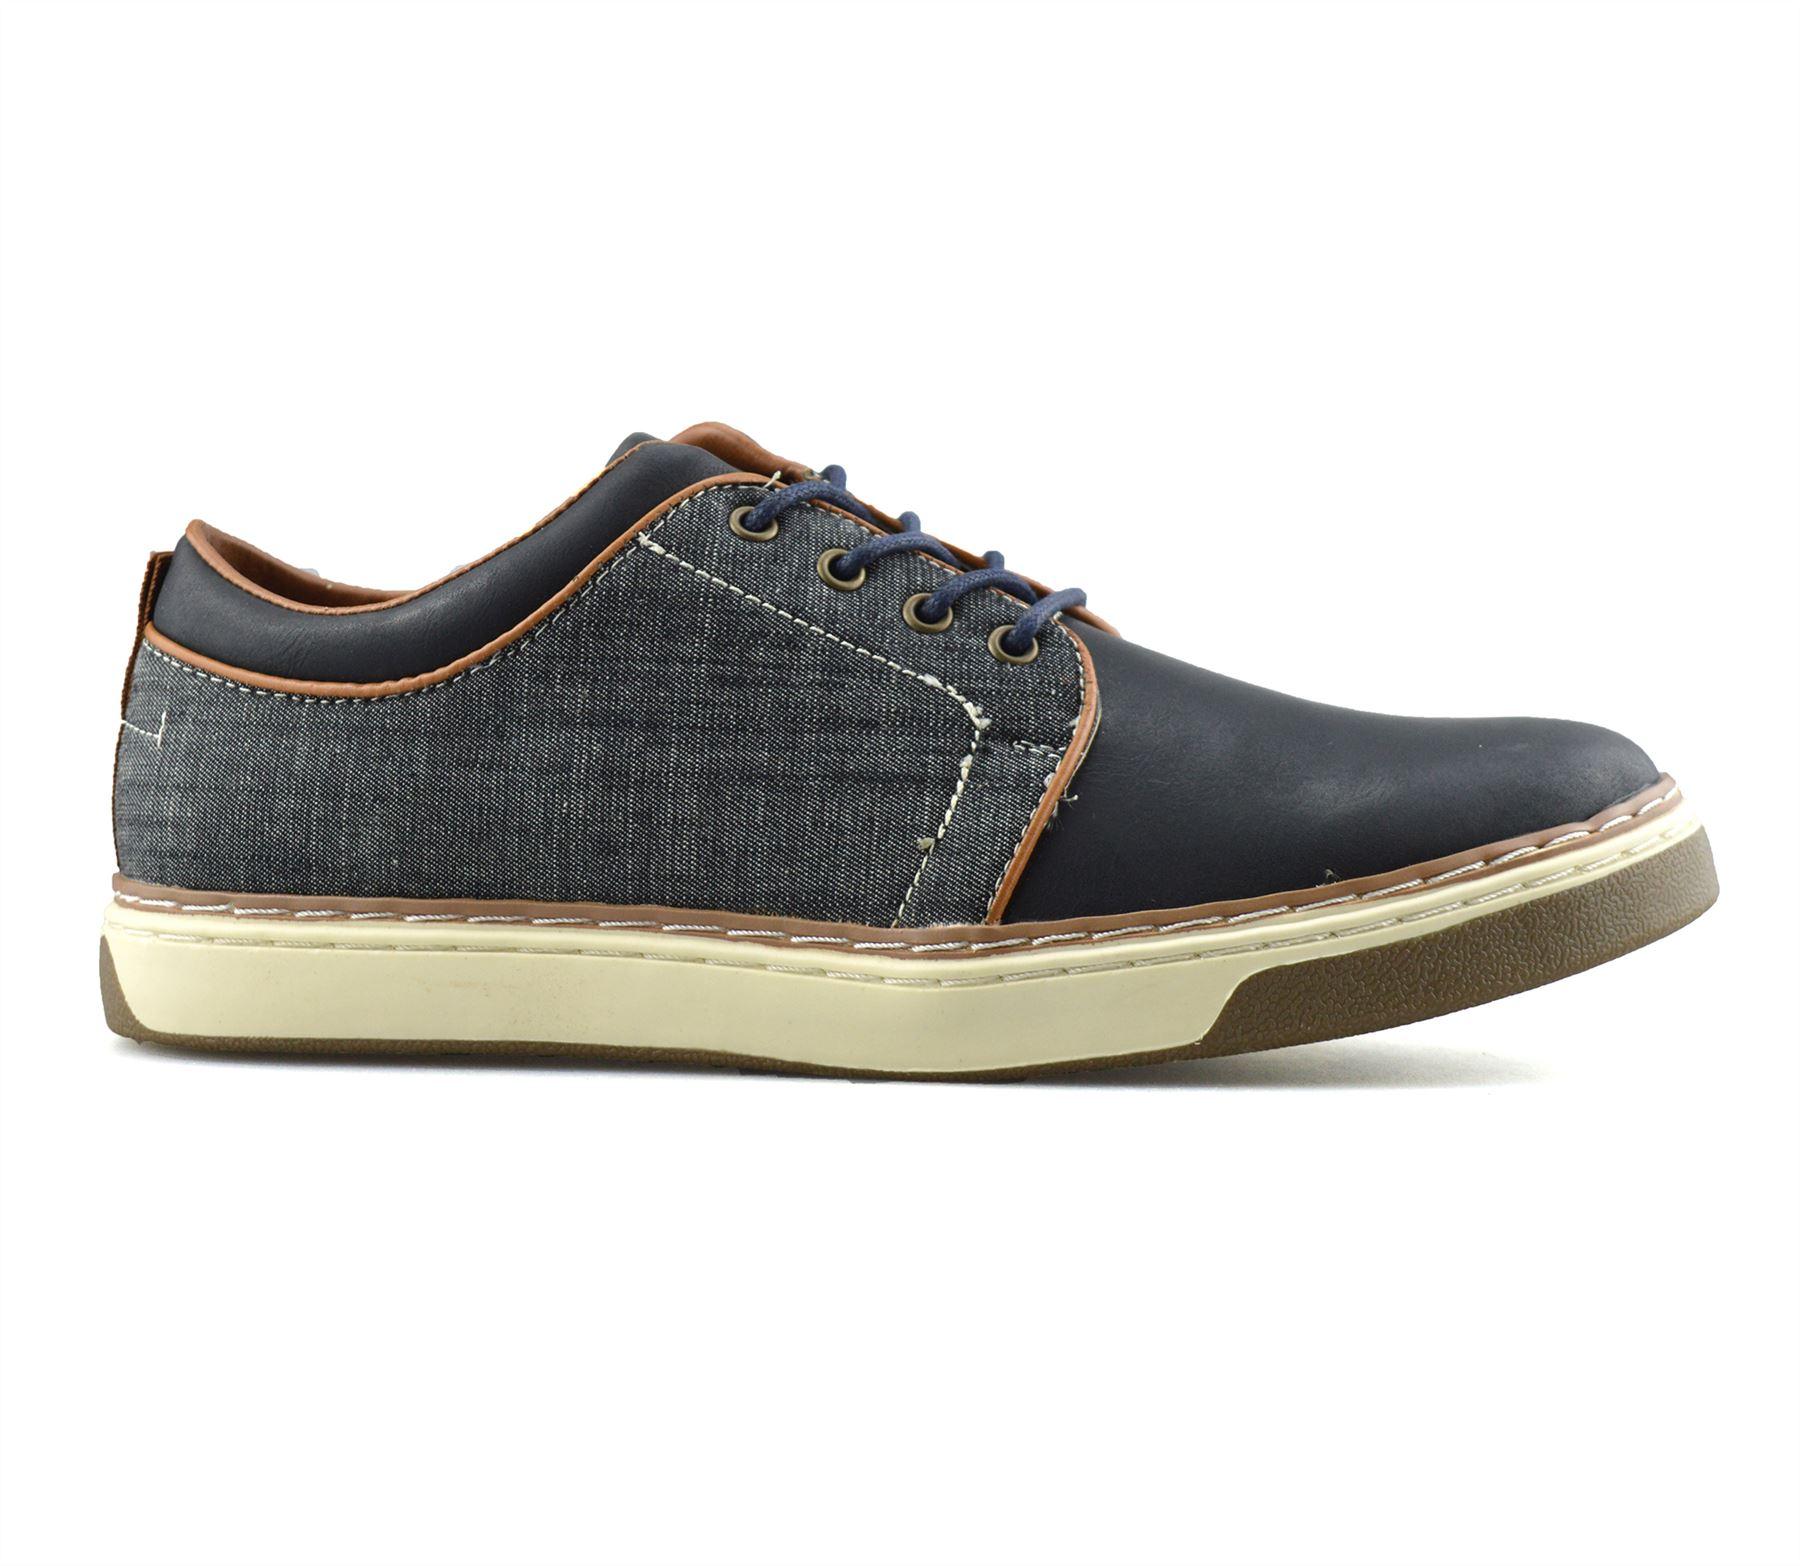 Homme-Nouveau-Casual-Smart-bateau-pont-Mocassin-Walking-Driving-Work-Lace-Up-Chaussures-Taille miniature 13